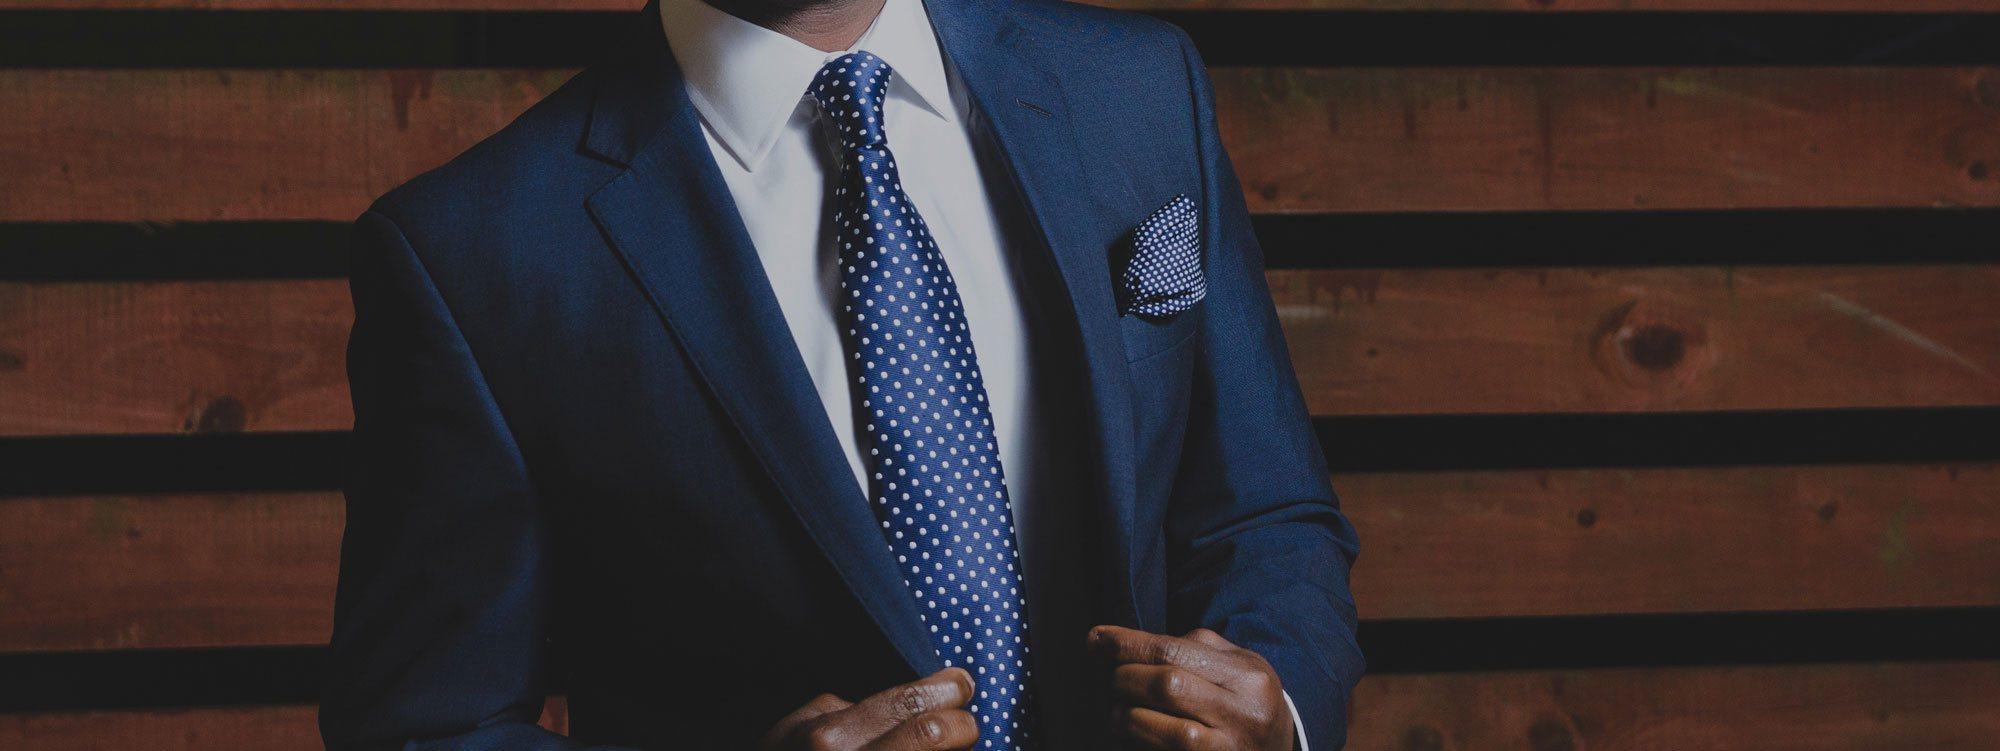 suit-slider1